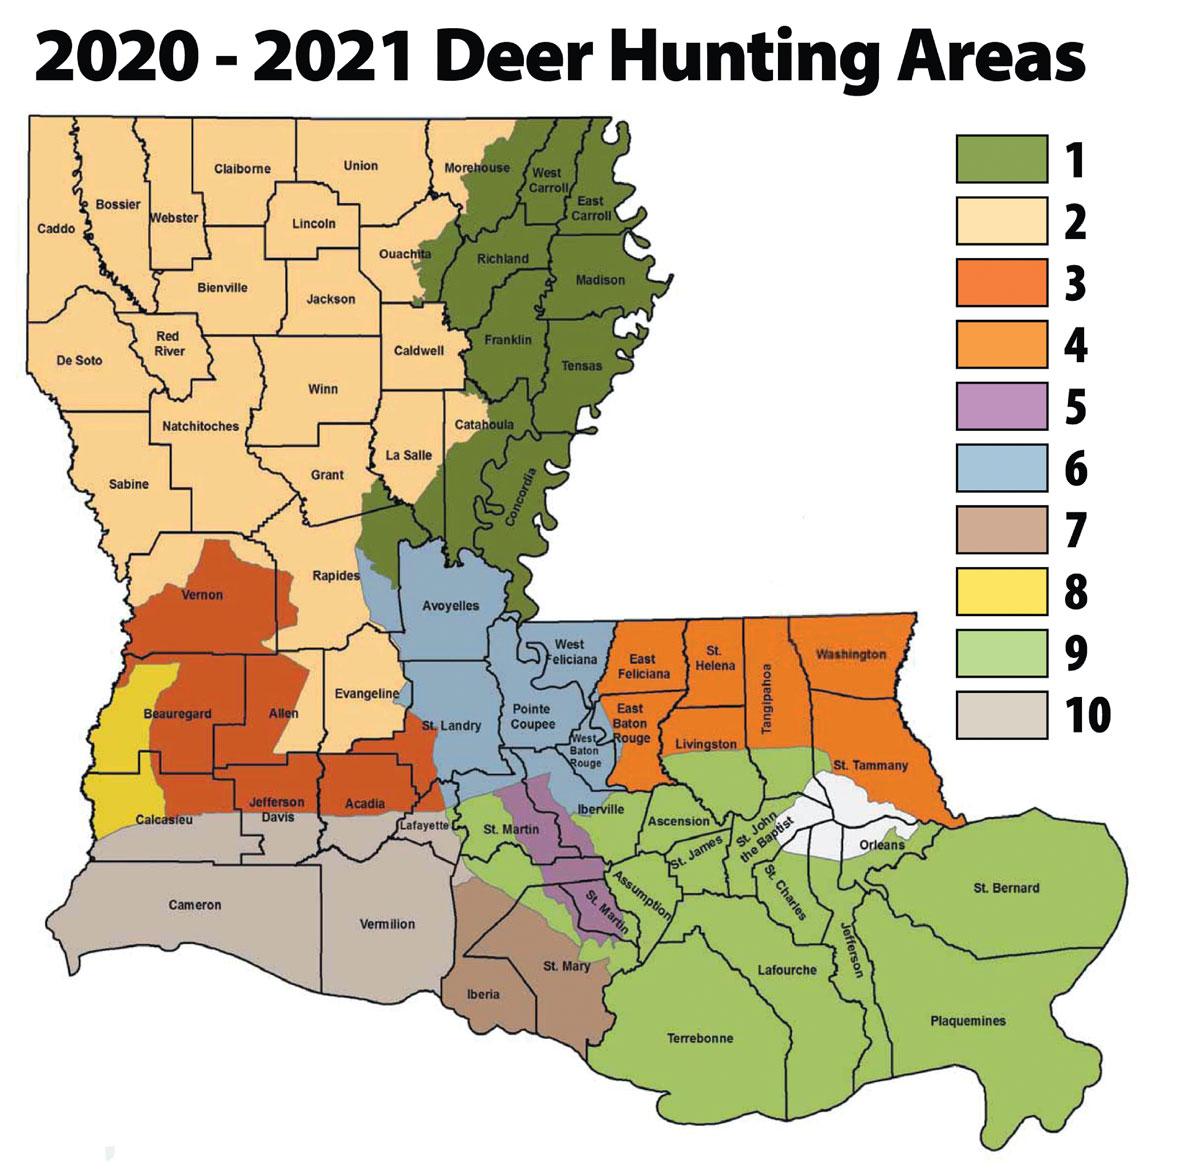 Louisiana'S 2020 Rut Report - Louisiana Sportsman with Deer Rut Map